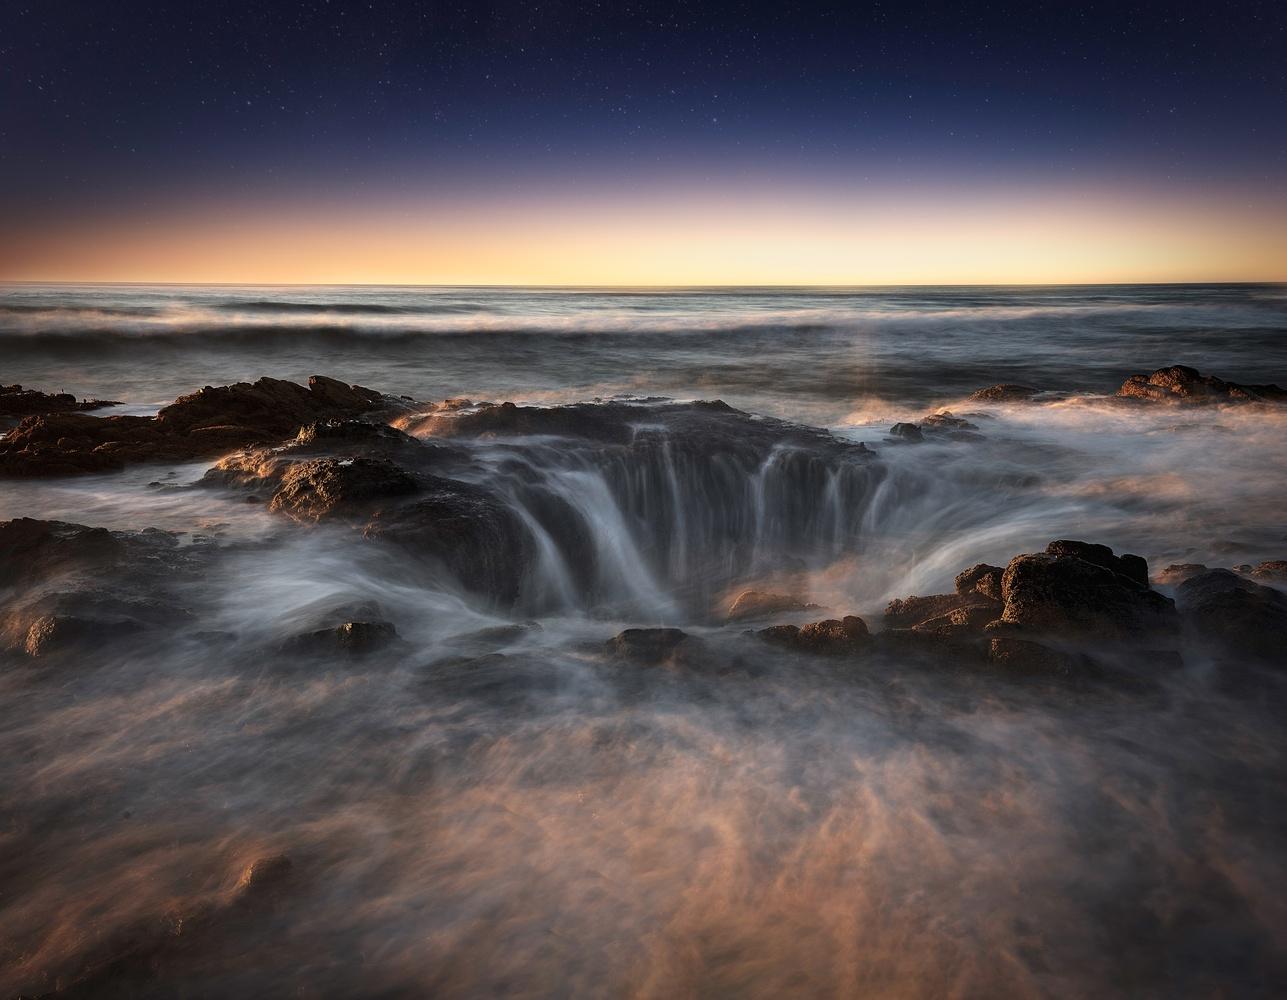 Thor's Well by John Vander Ploeg